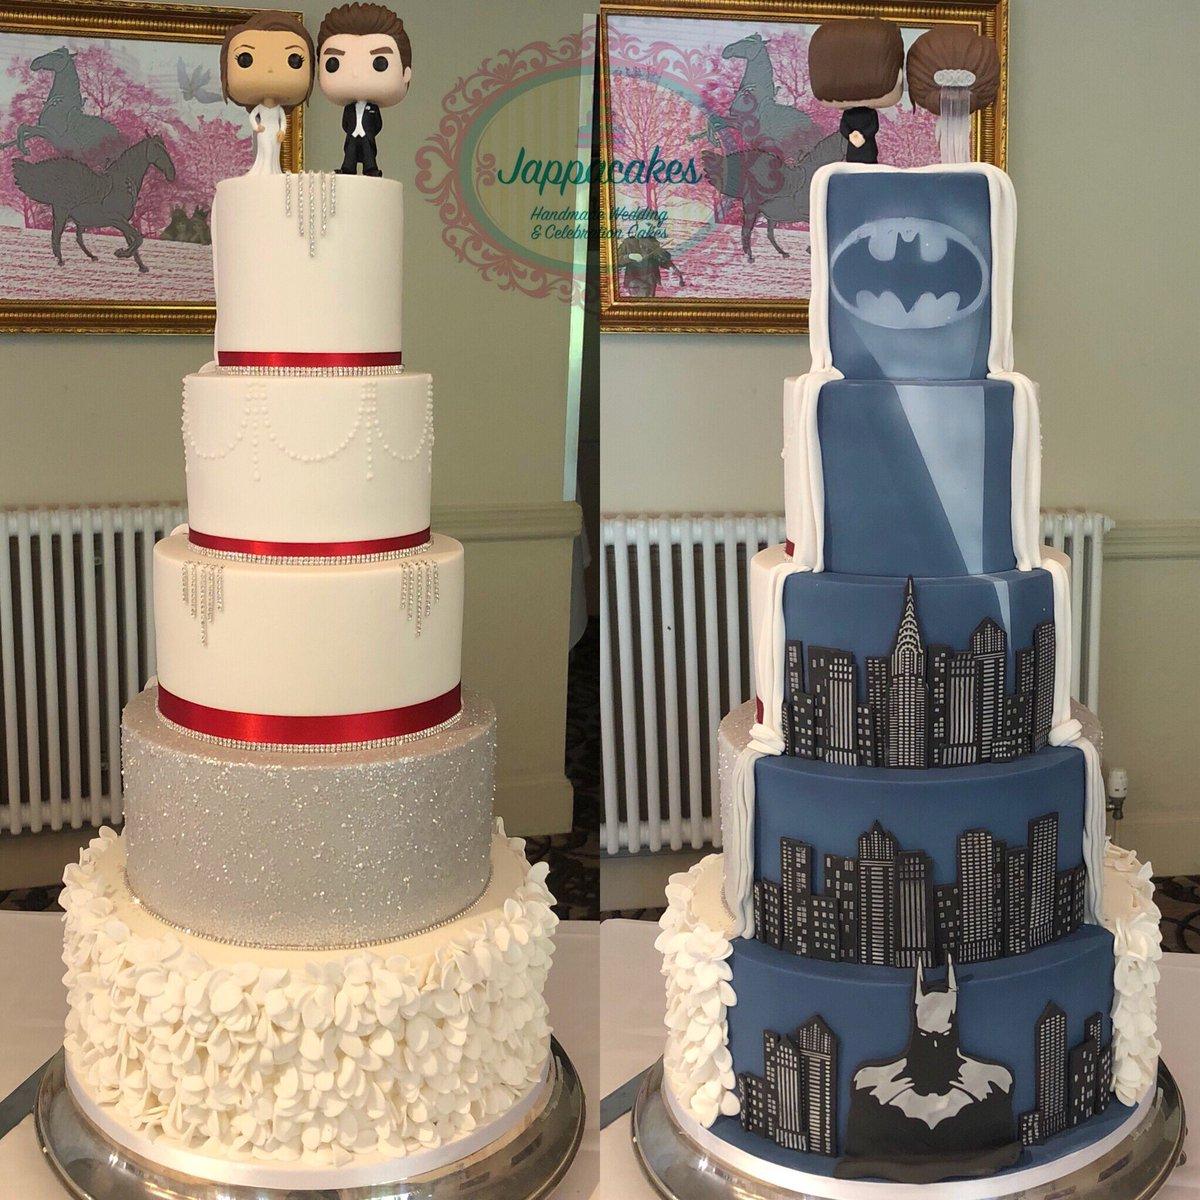 Batman Wedding Cake.Jappacakes On Twitter Batman Wedding Cake